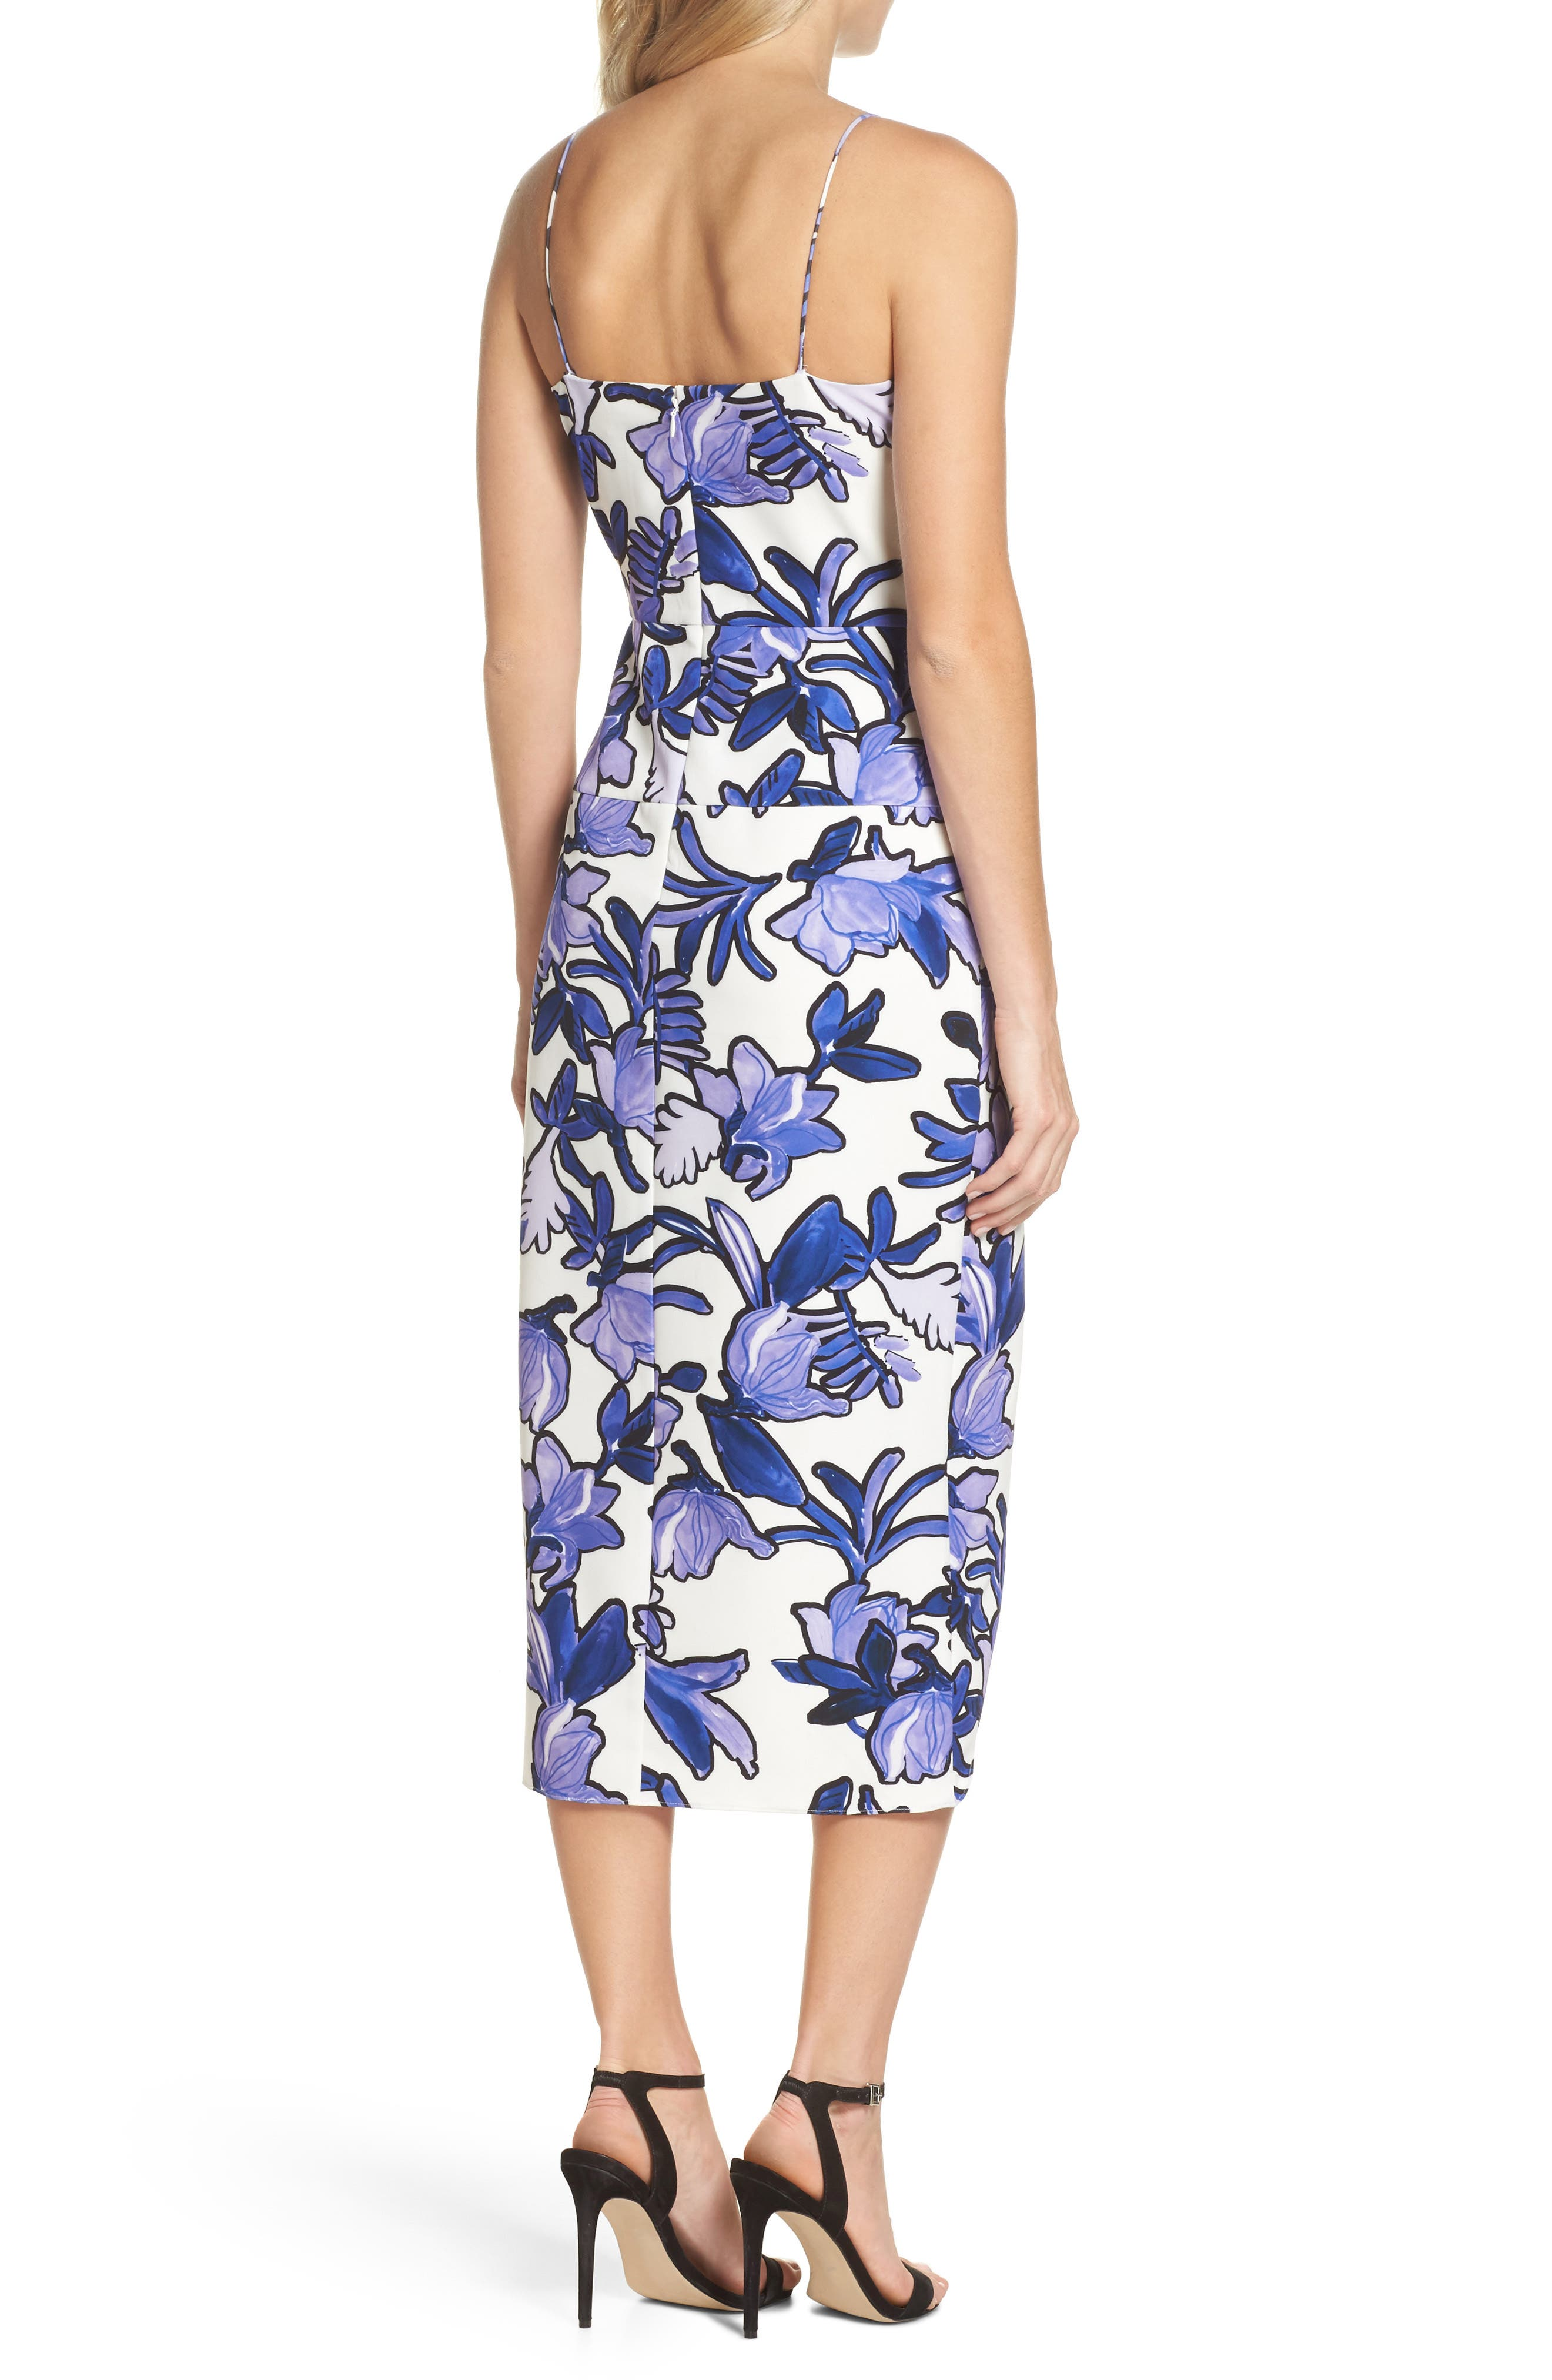 Floral Midi Dress,                             Alternate thumbnail 2, color,                             Ivory Painted Iris Floral